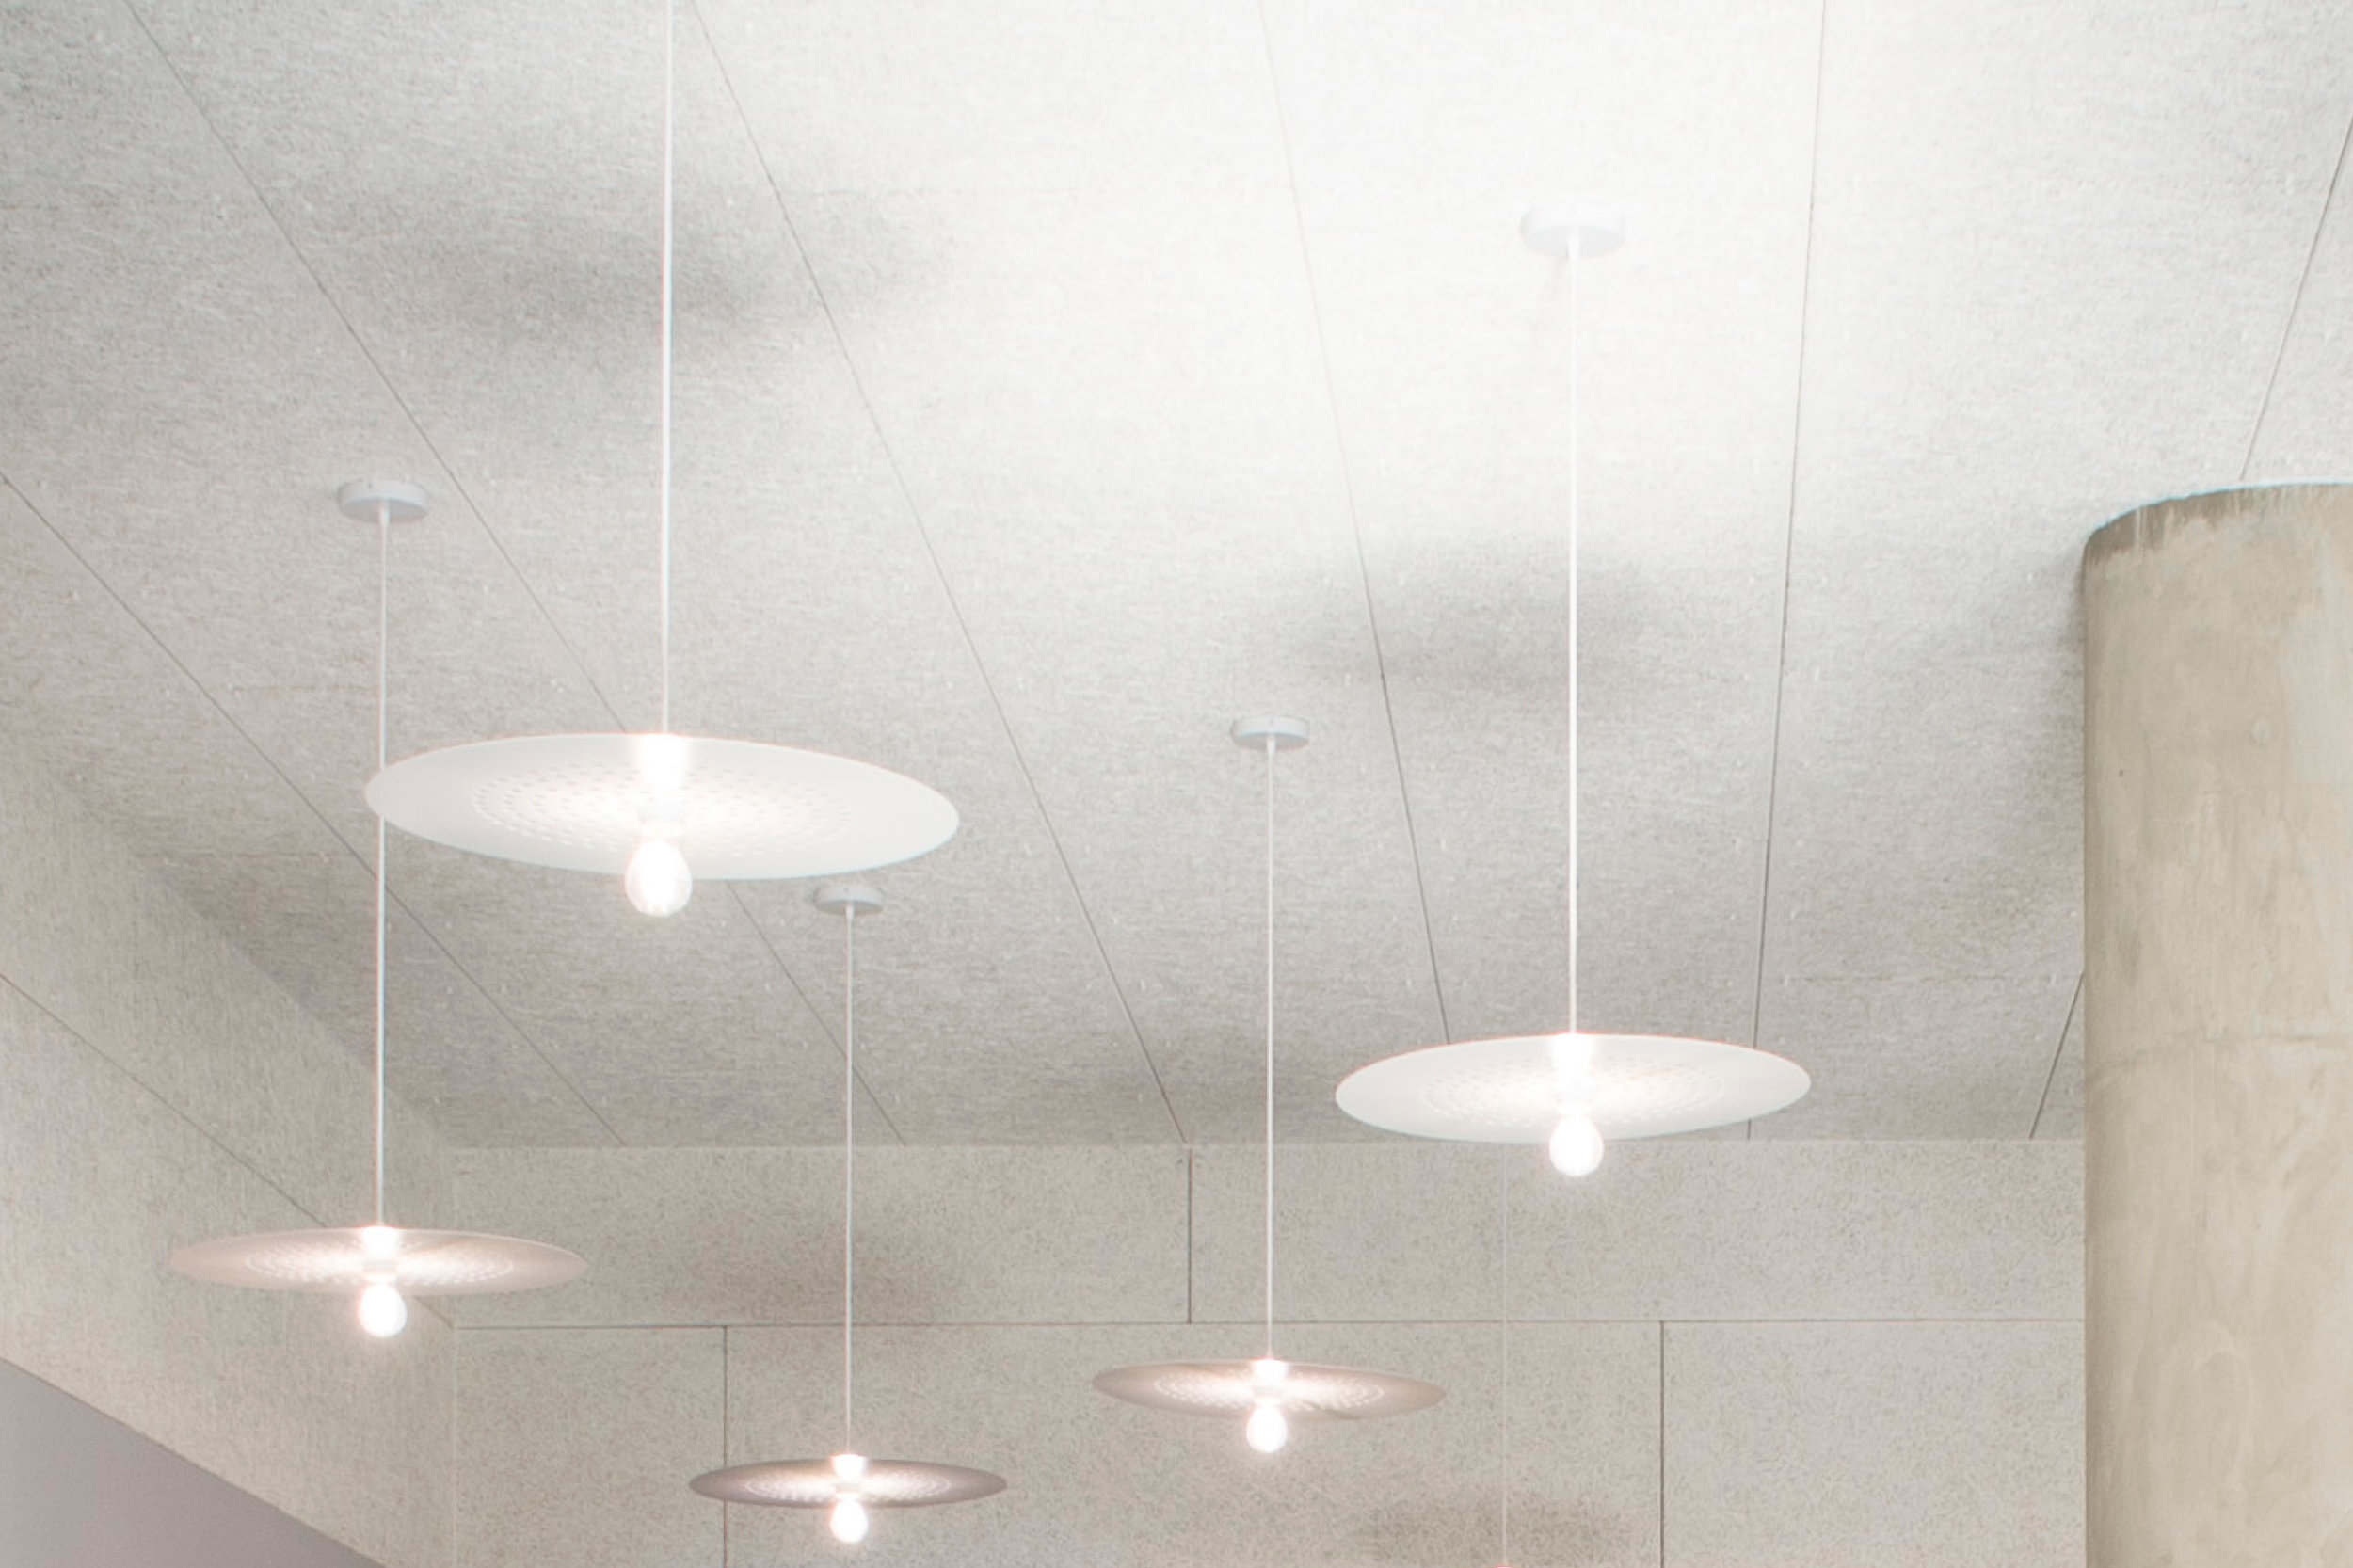 Superlight Pendants Installed at NB Studio in London